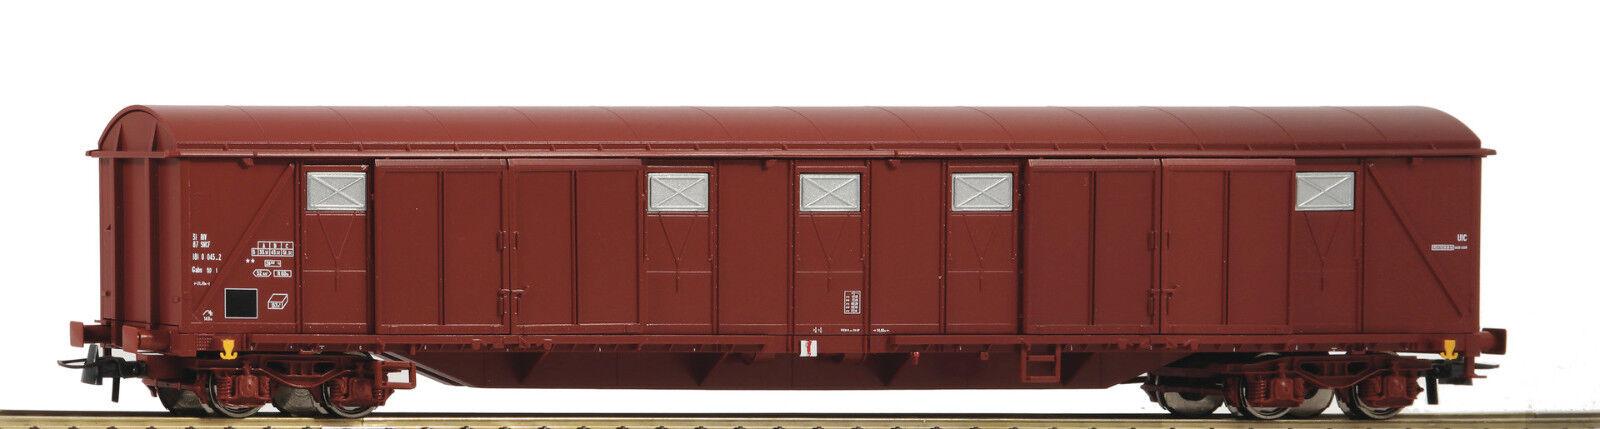 Roco 76856 76856 - Box goods wagon, SNCF, HO